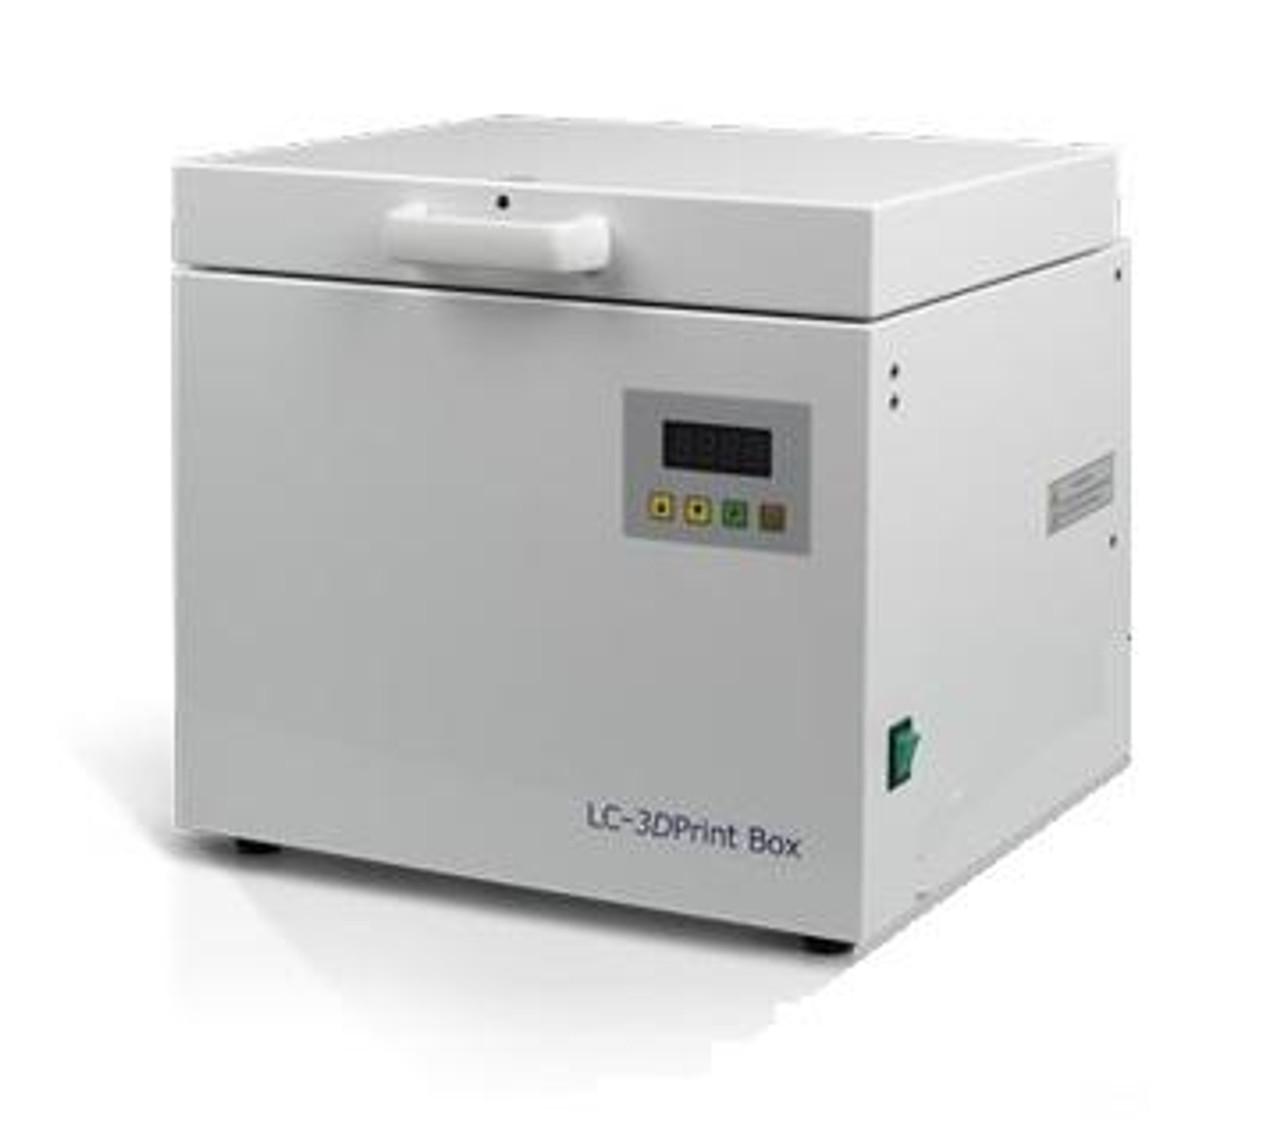 LC-3DPrint Box UV Post-Curing Unit